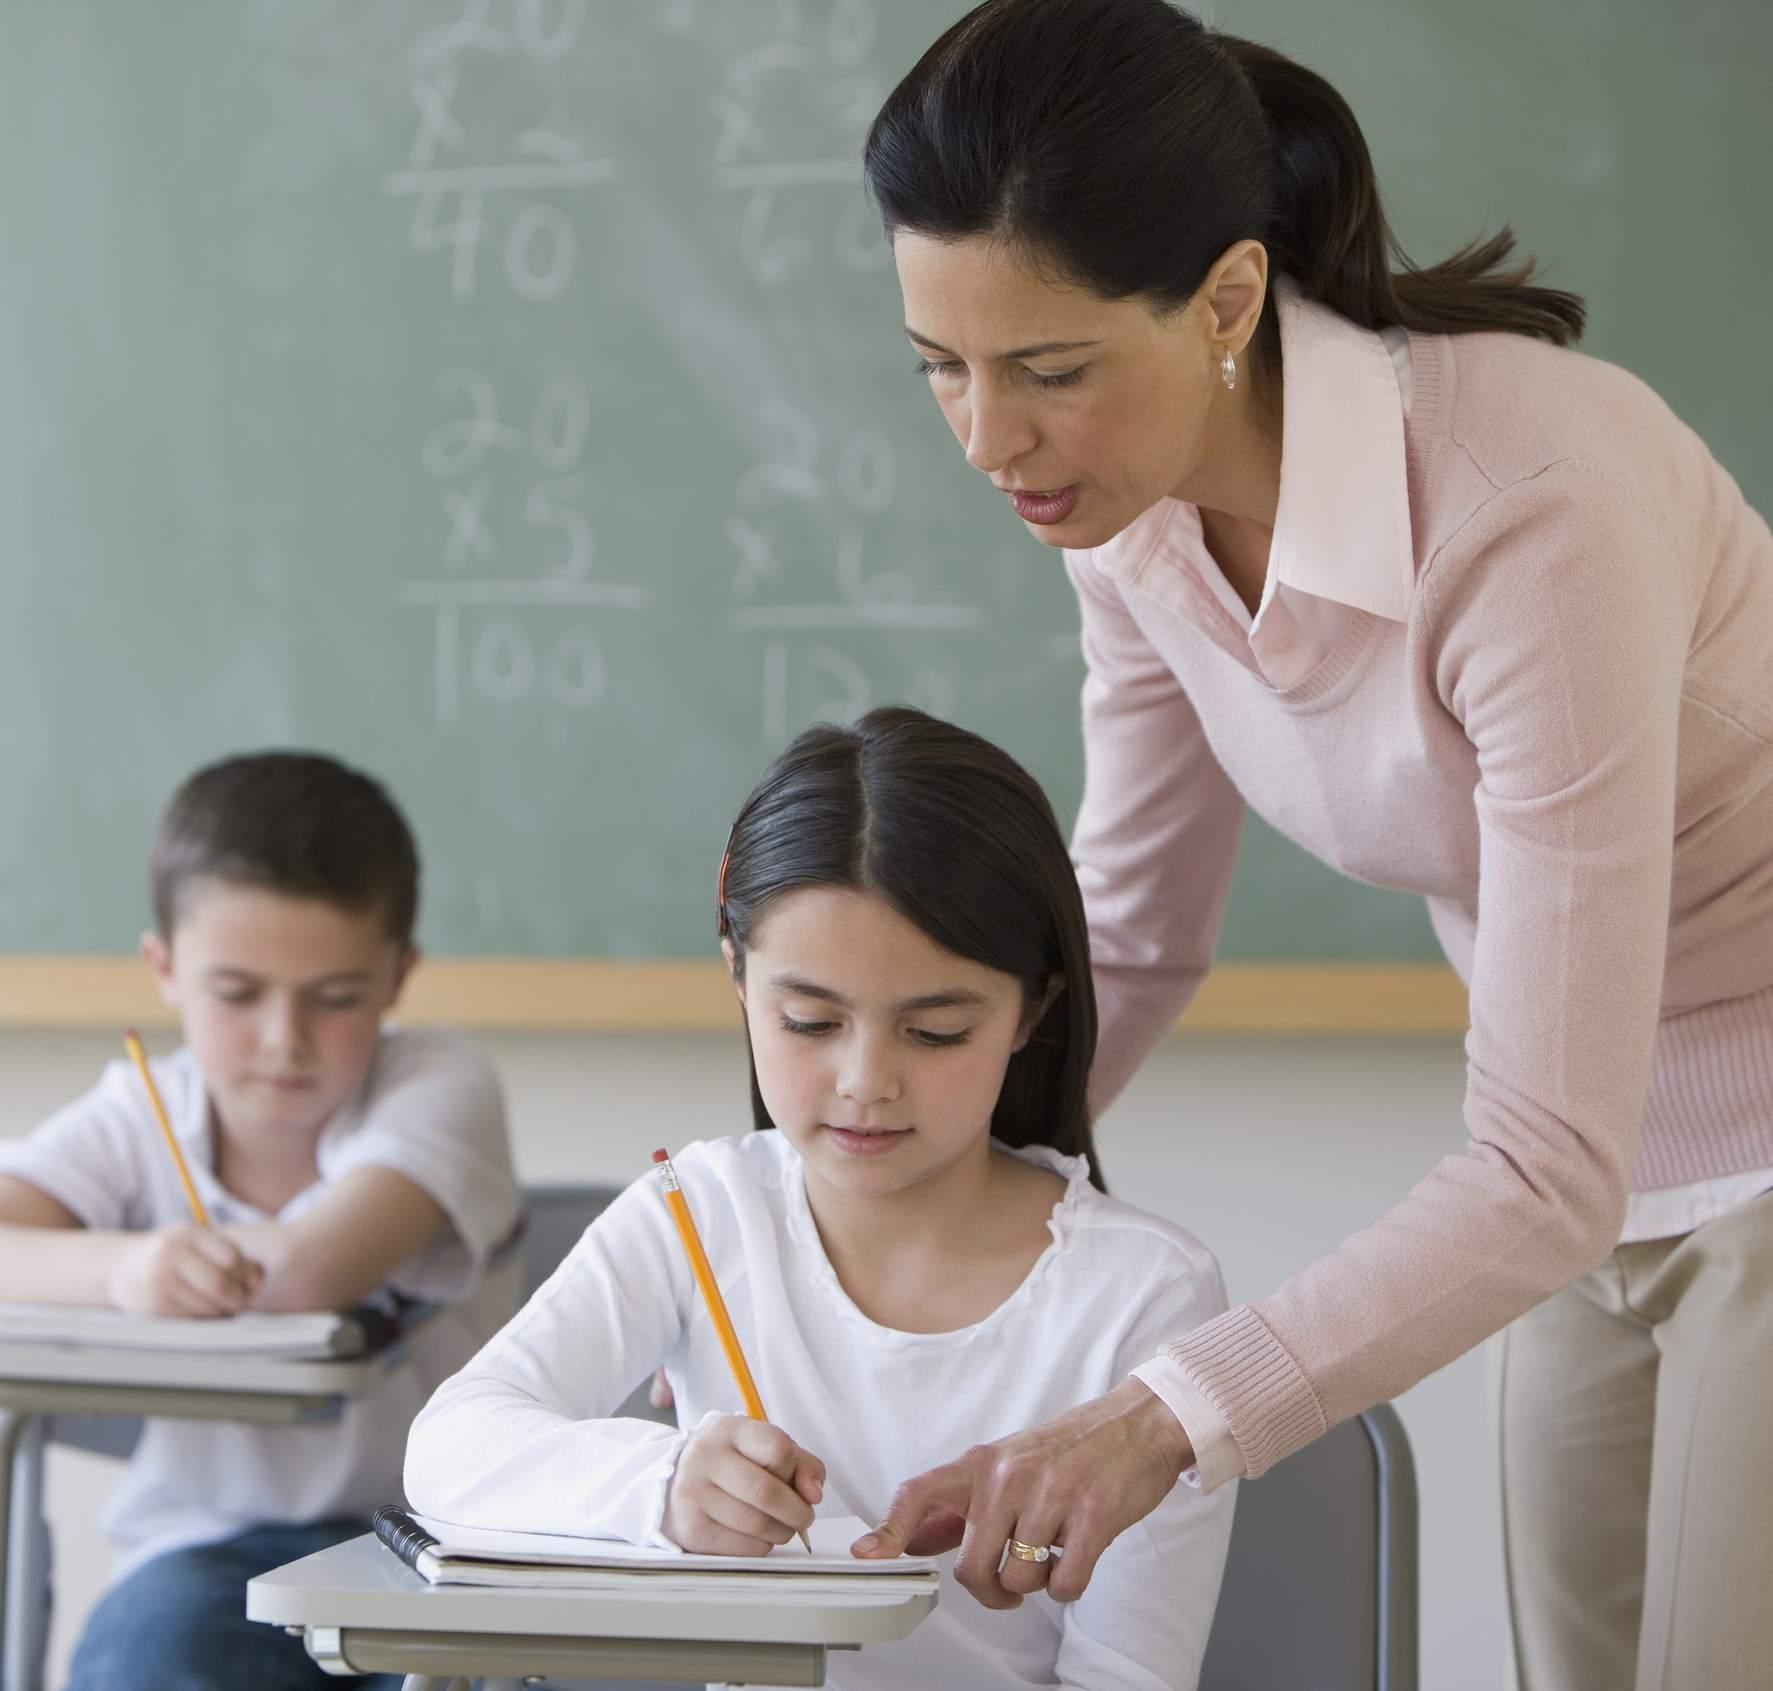 Female teacher helping student